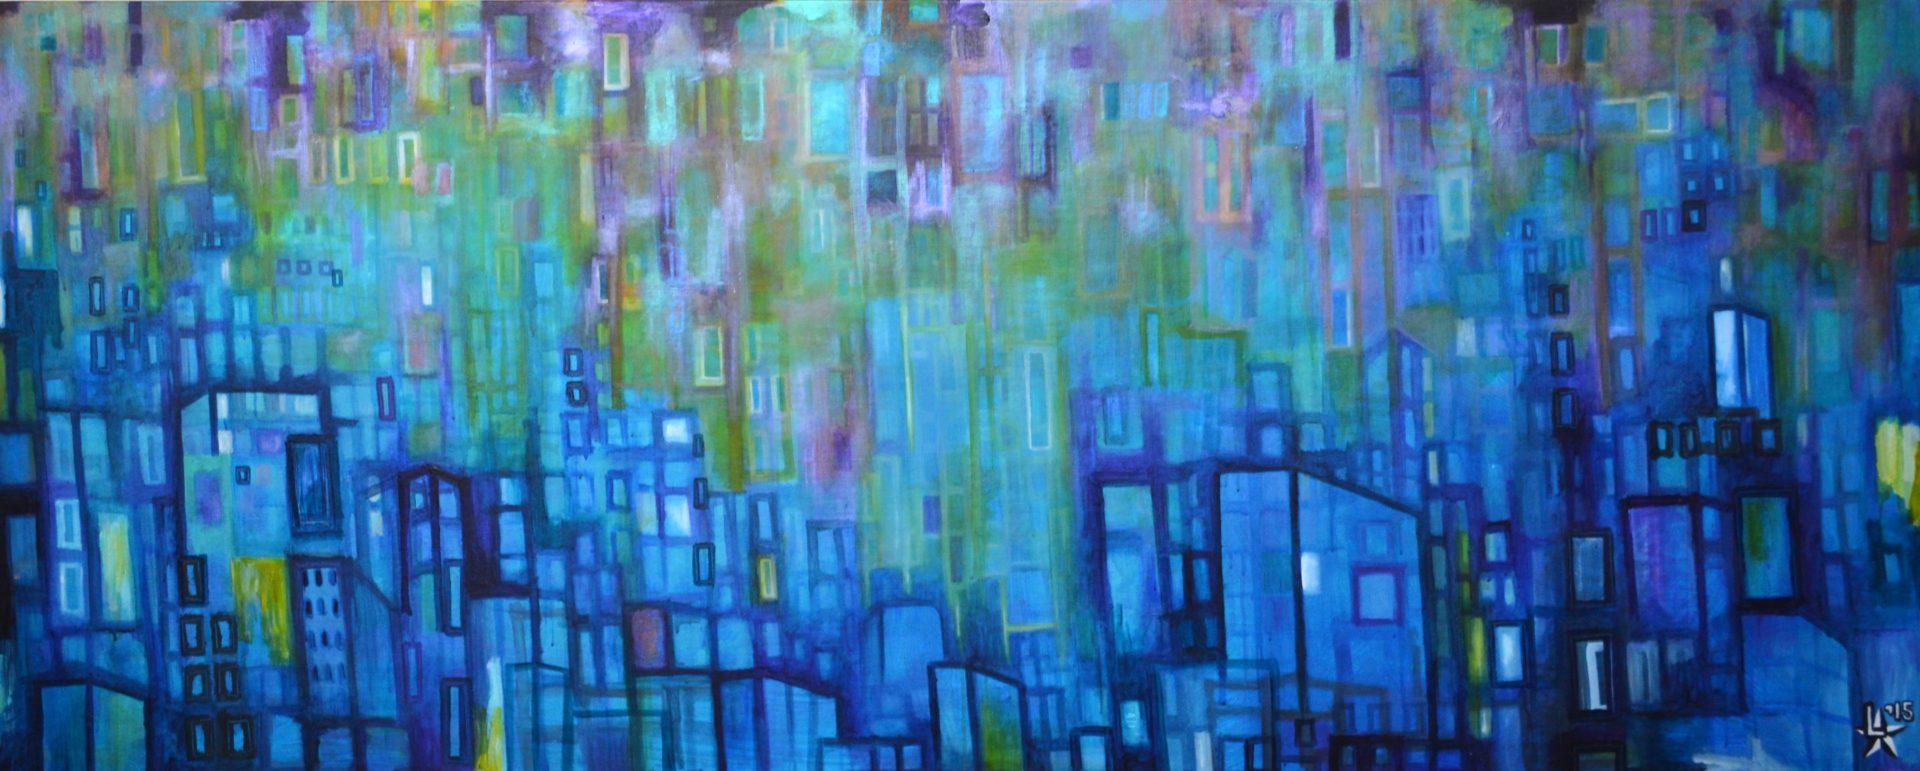 kunstenaar utrecht kunst ltuziasm l-tuziasm schilderij art artist painting urban landscape city trippin fuel